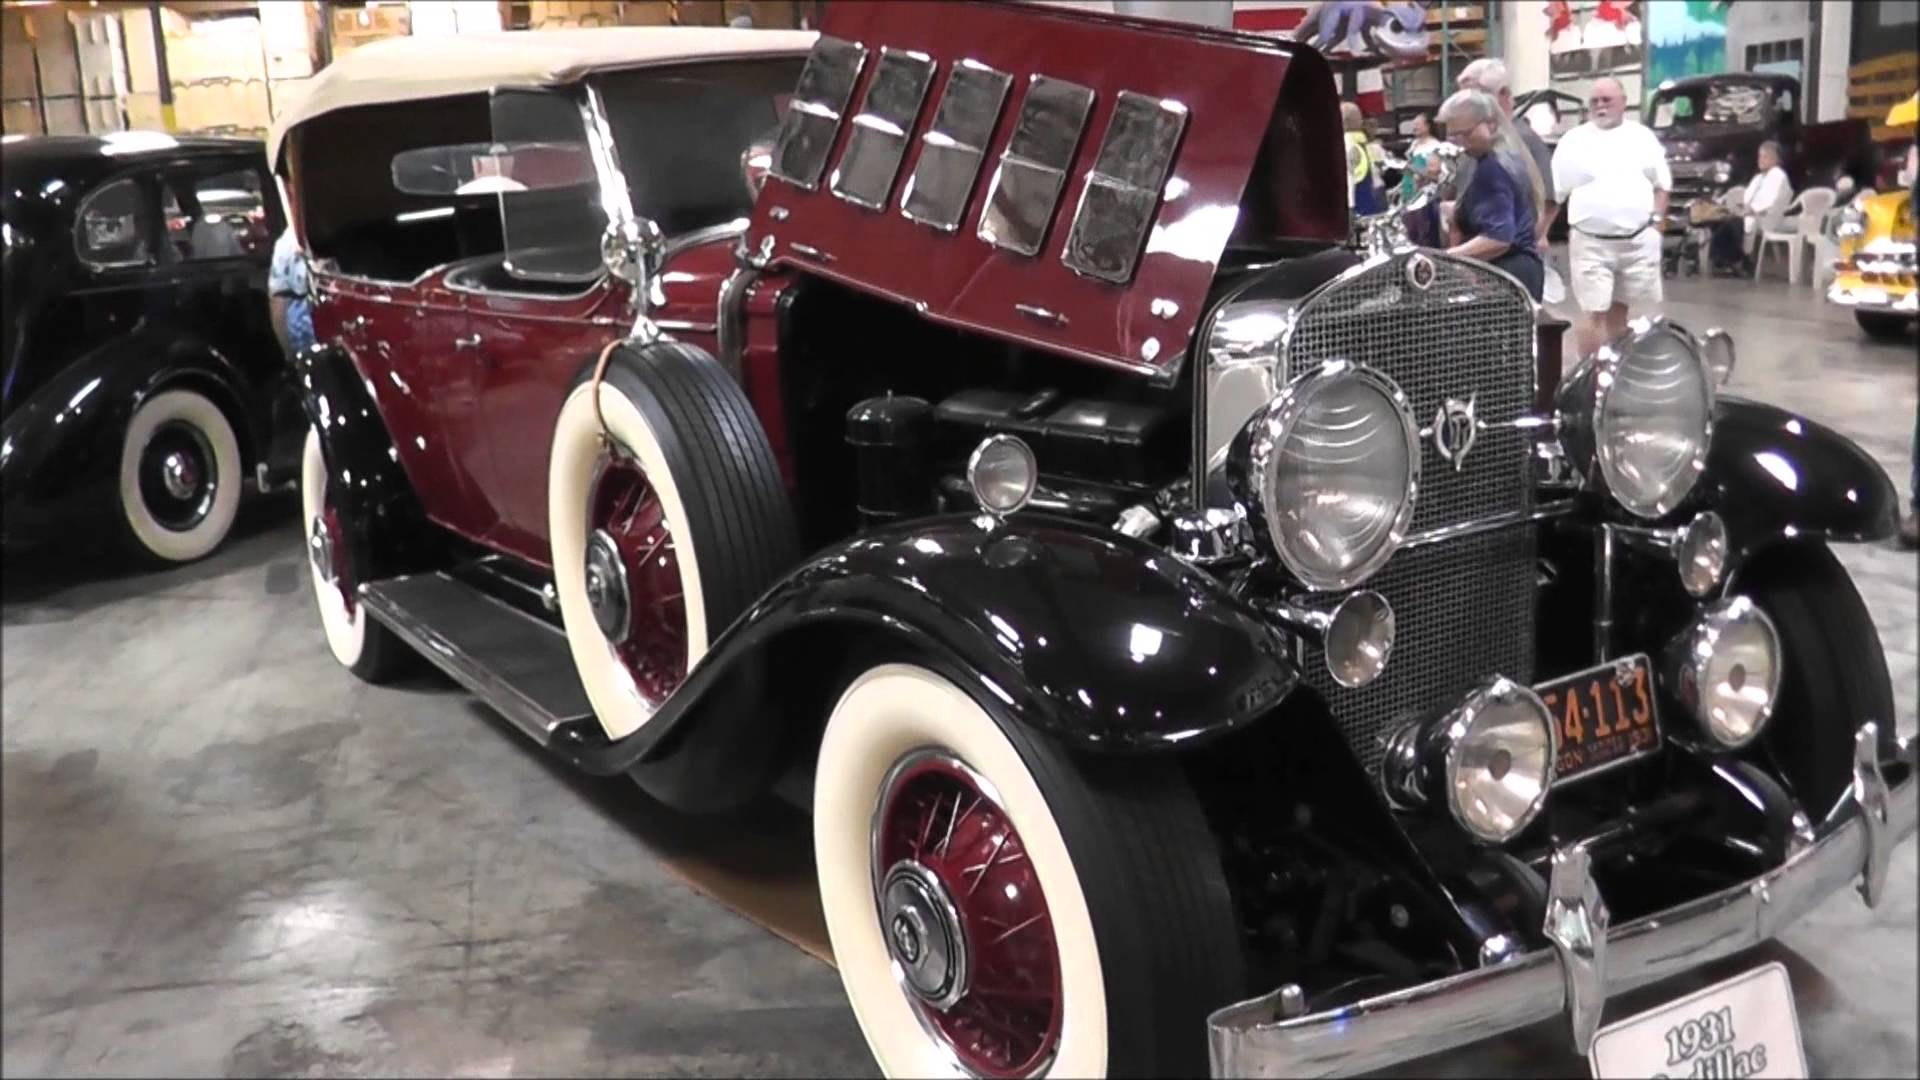 High Resolution Wallpaper | 1931 Cadillac V12 1920x1080 px